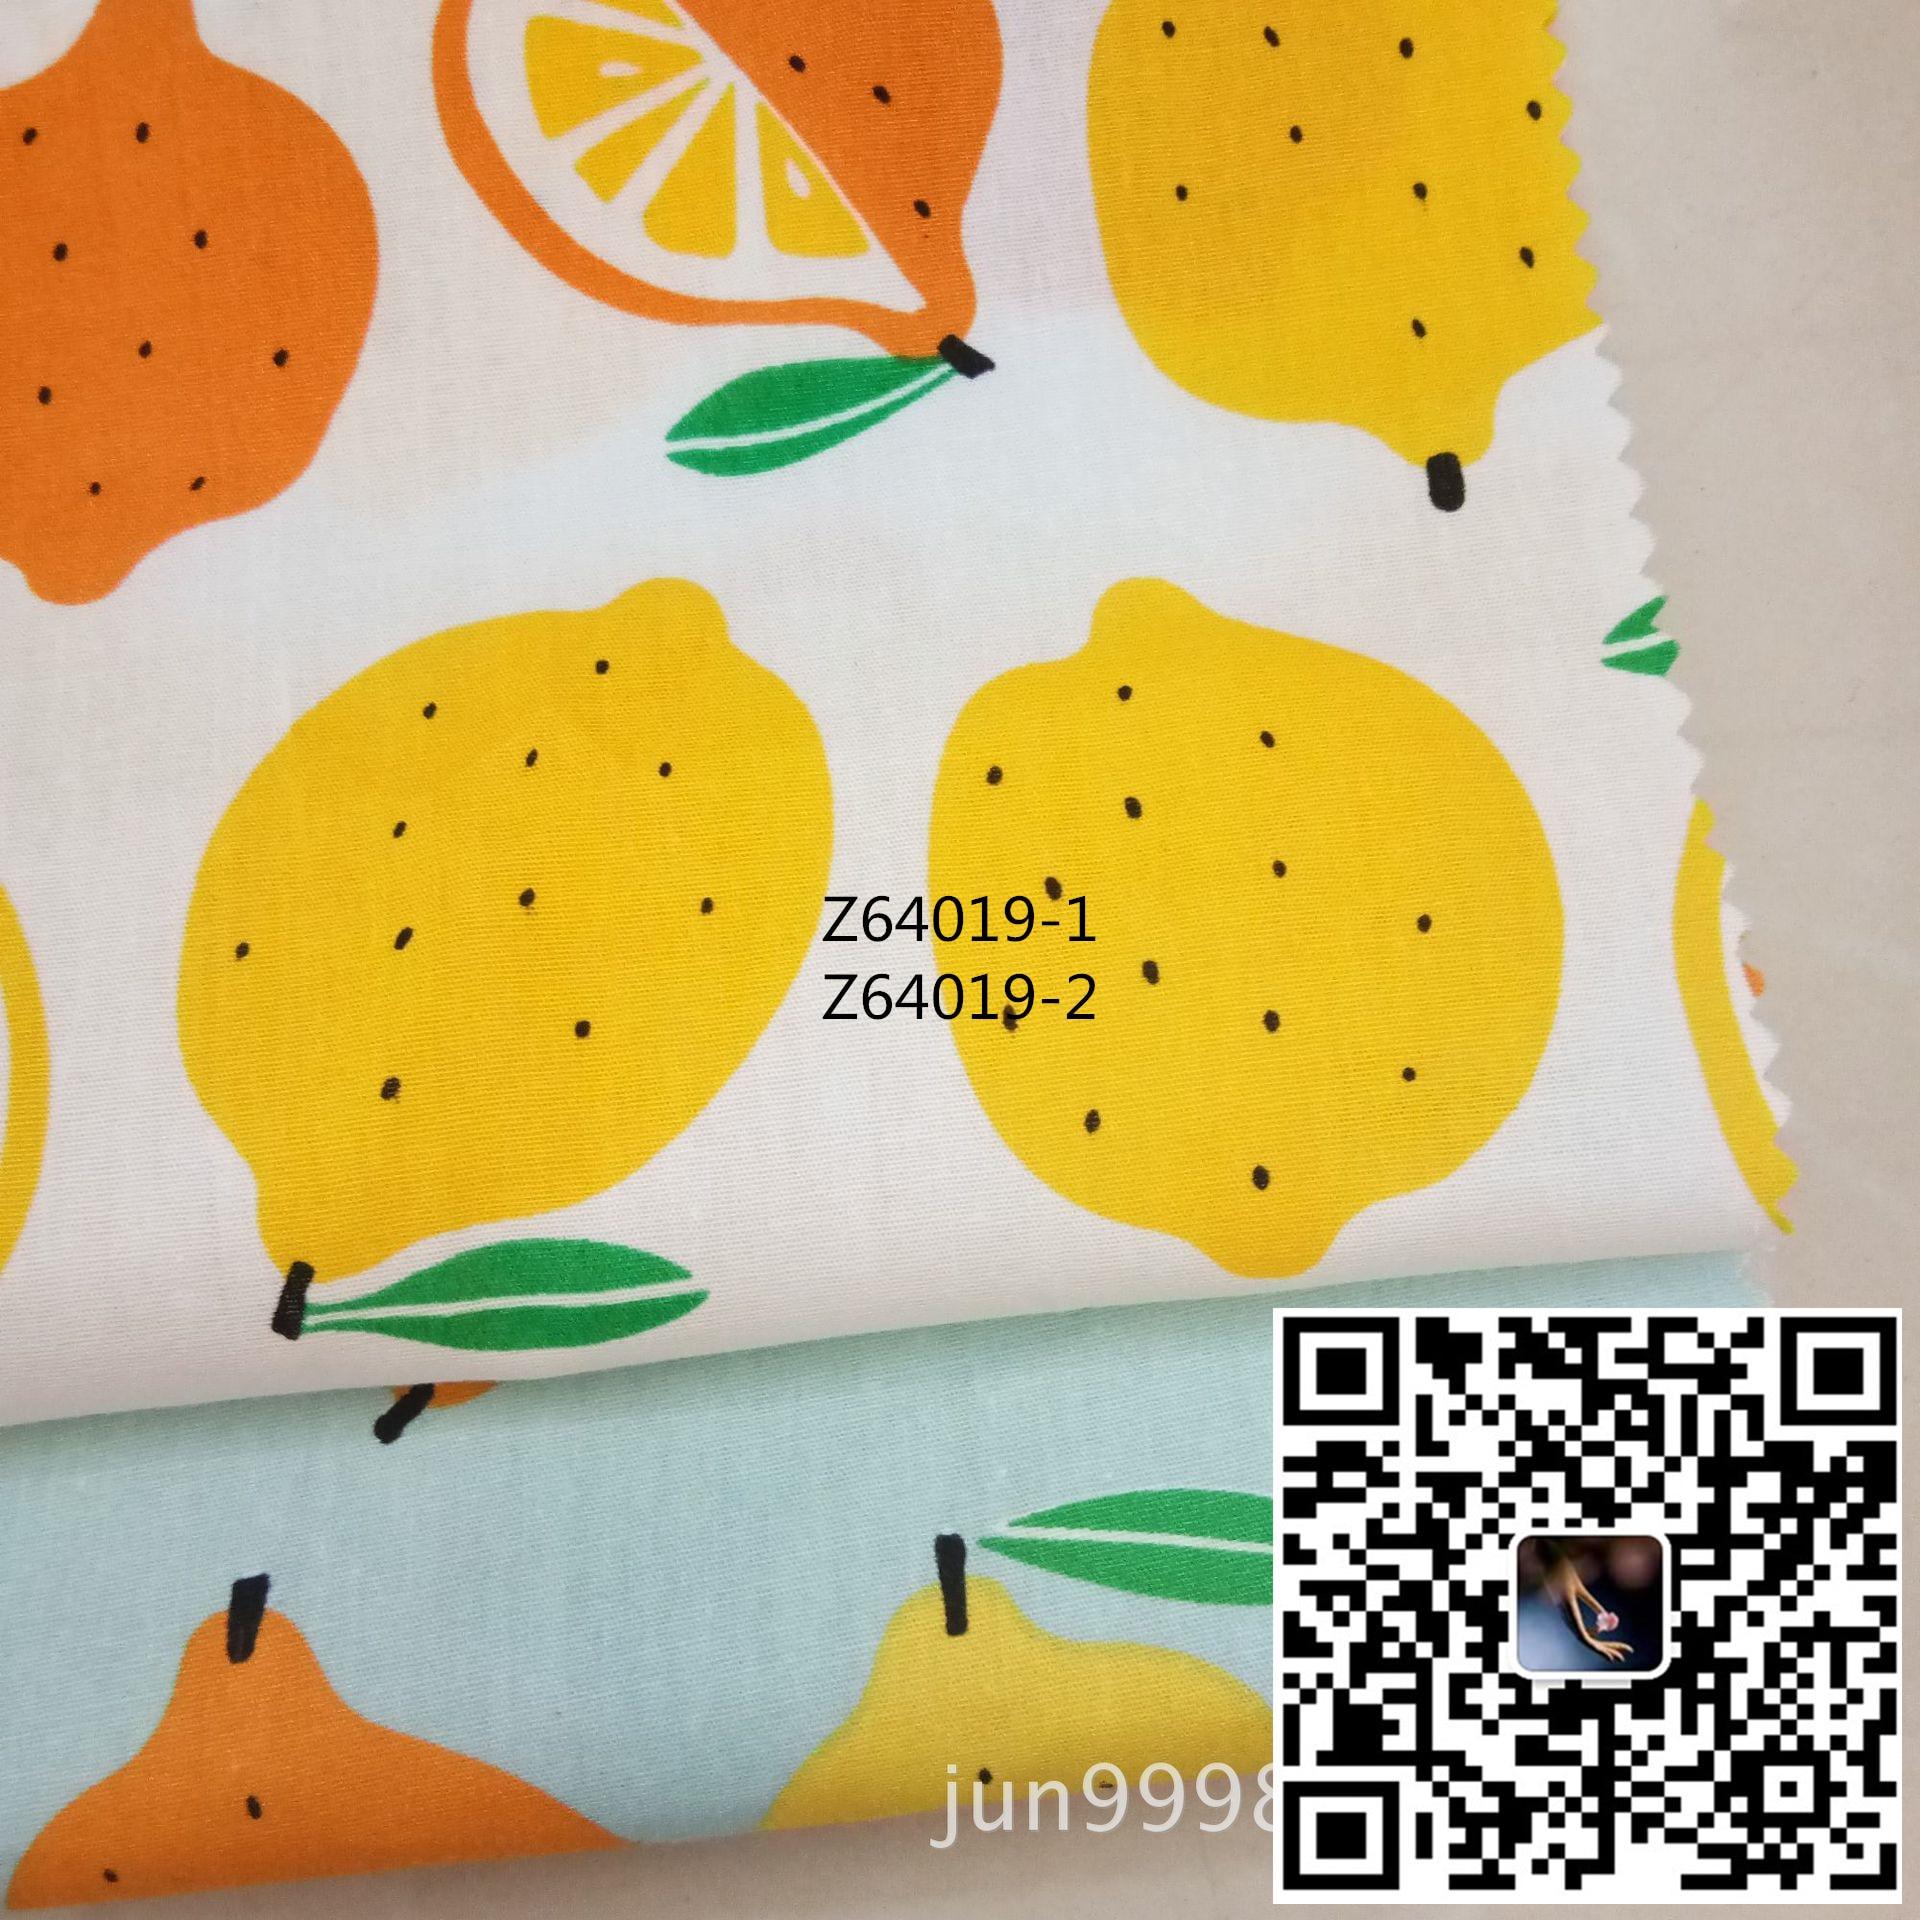 100% algodón popelina fruta de limón tela impresa, textil tejido, adecuado para ropa fundas de almohada, manteles, decorativo